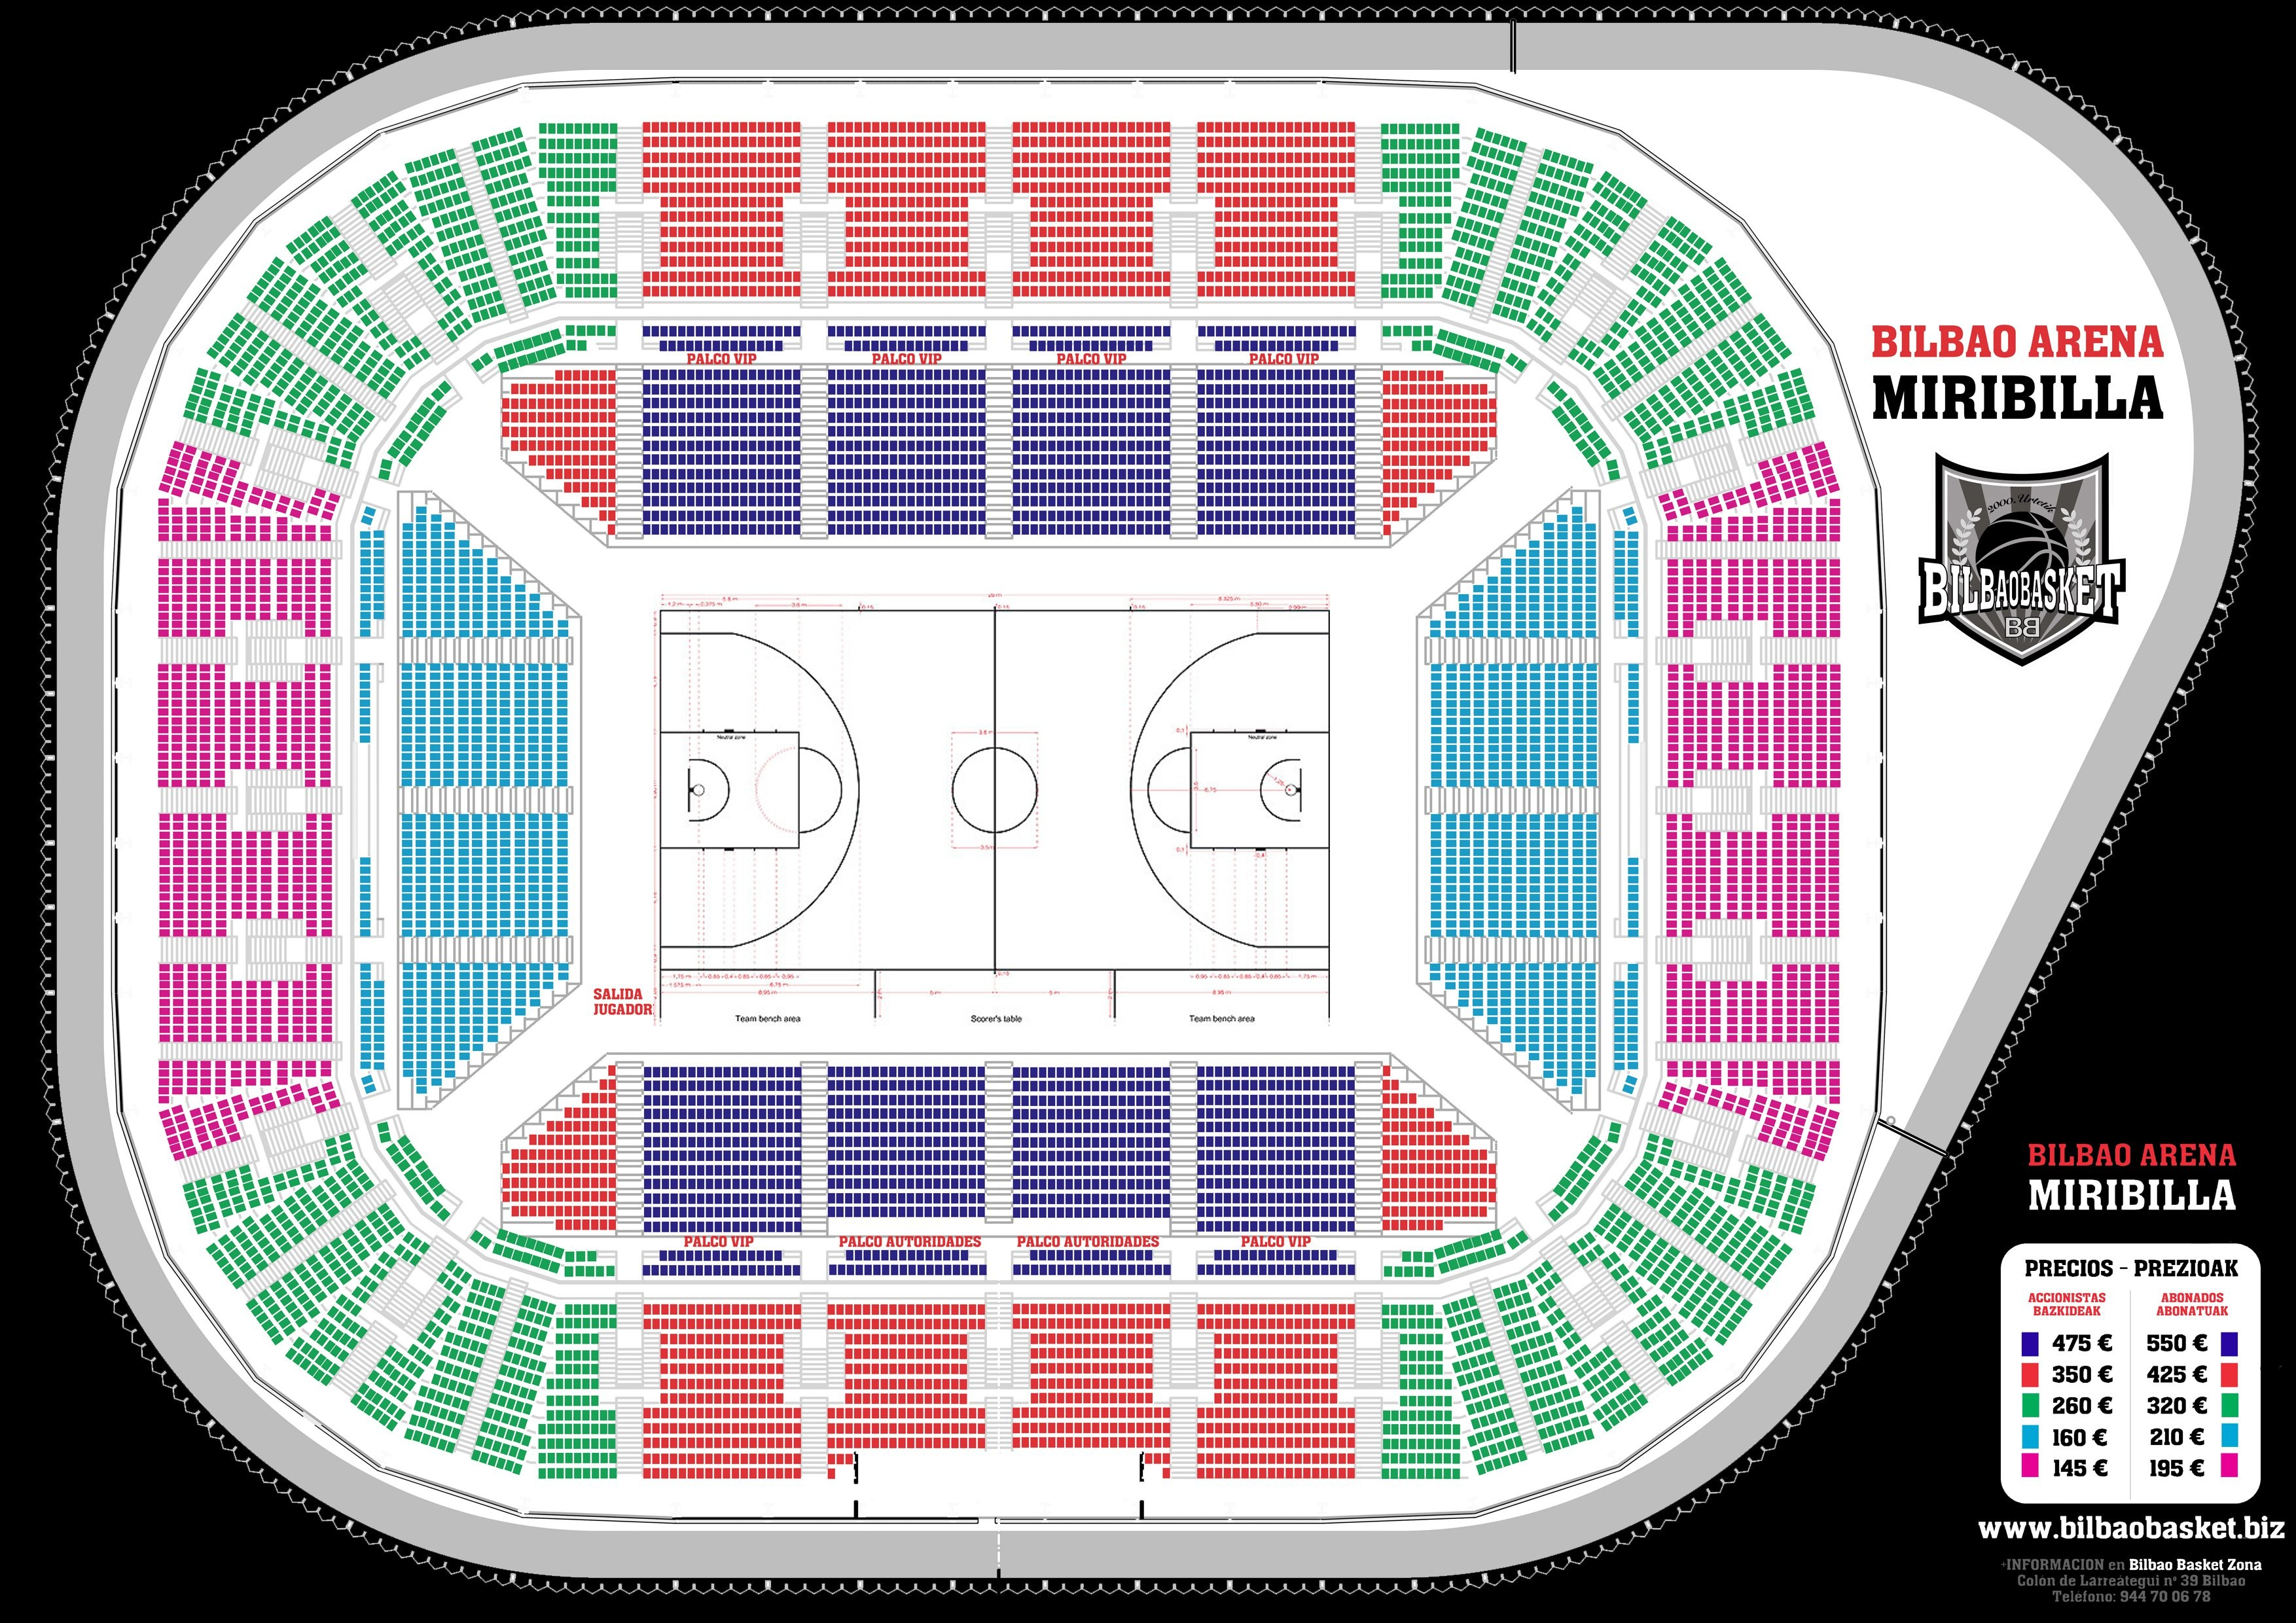 Bilbao Arena Miribilla 3